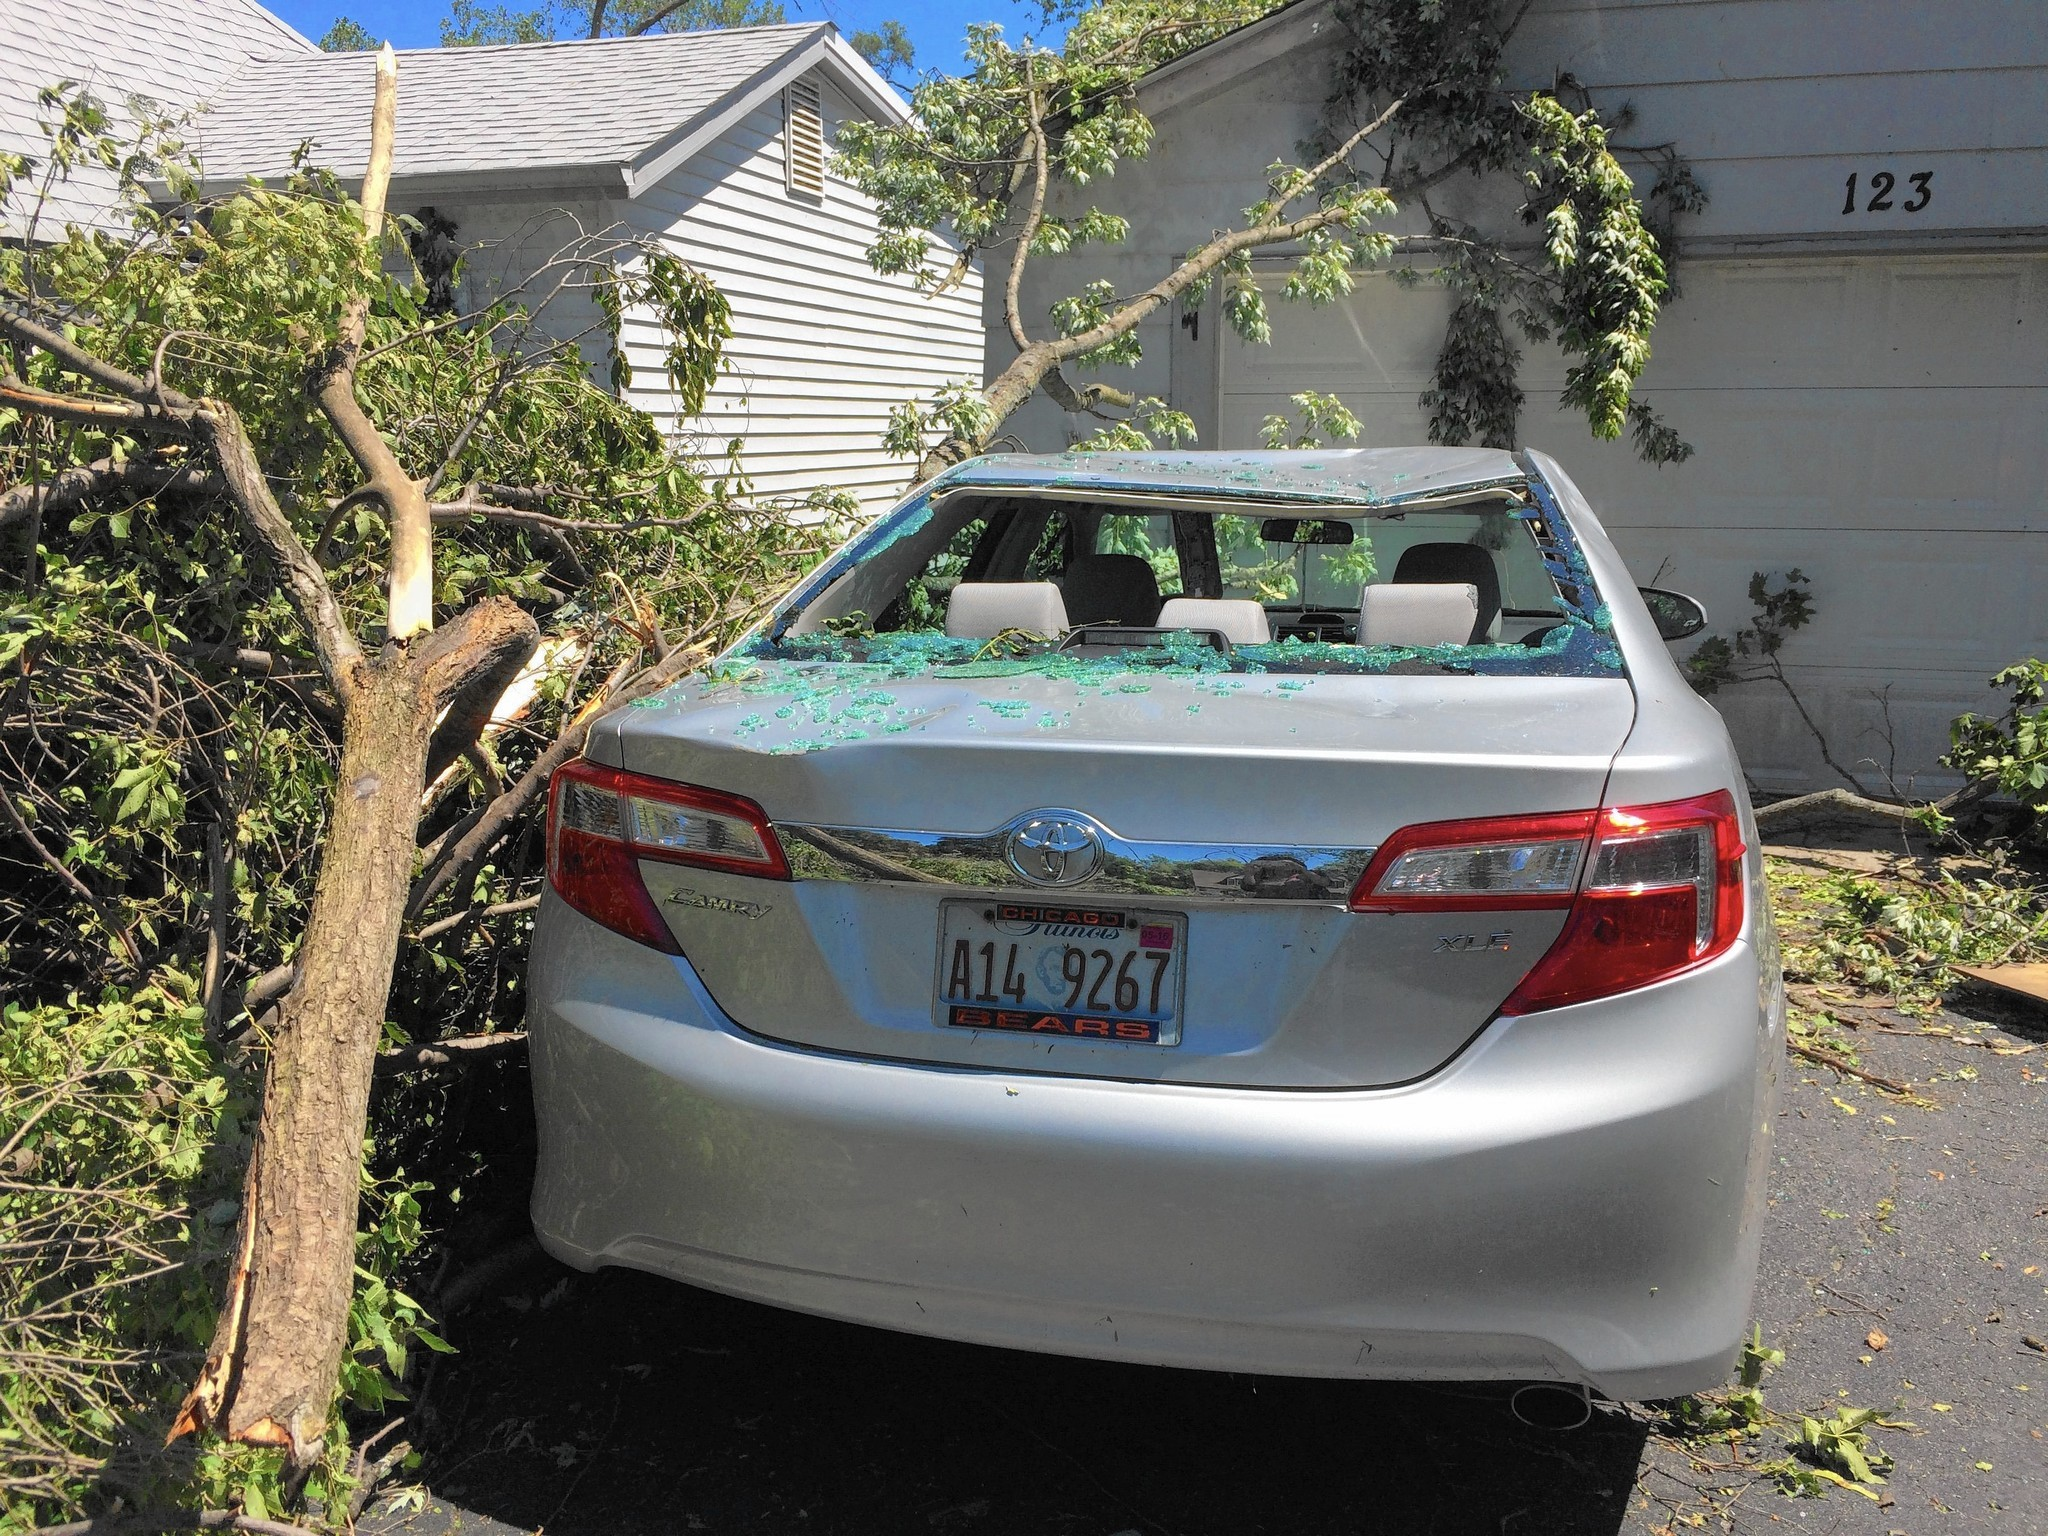 Tornado slipped under radar, emergency officials say